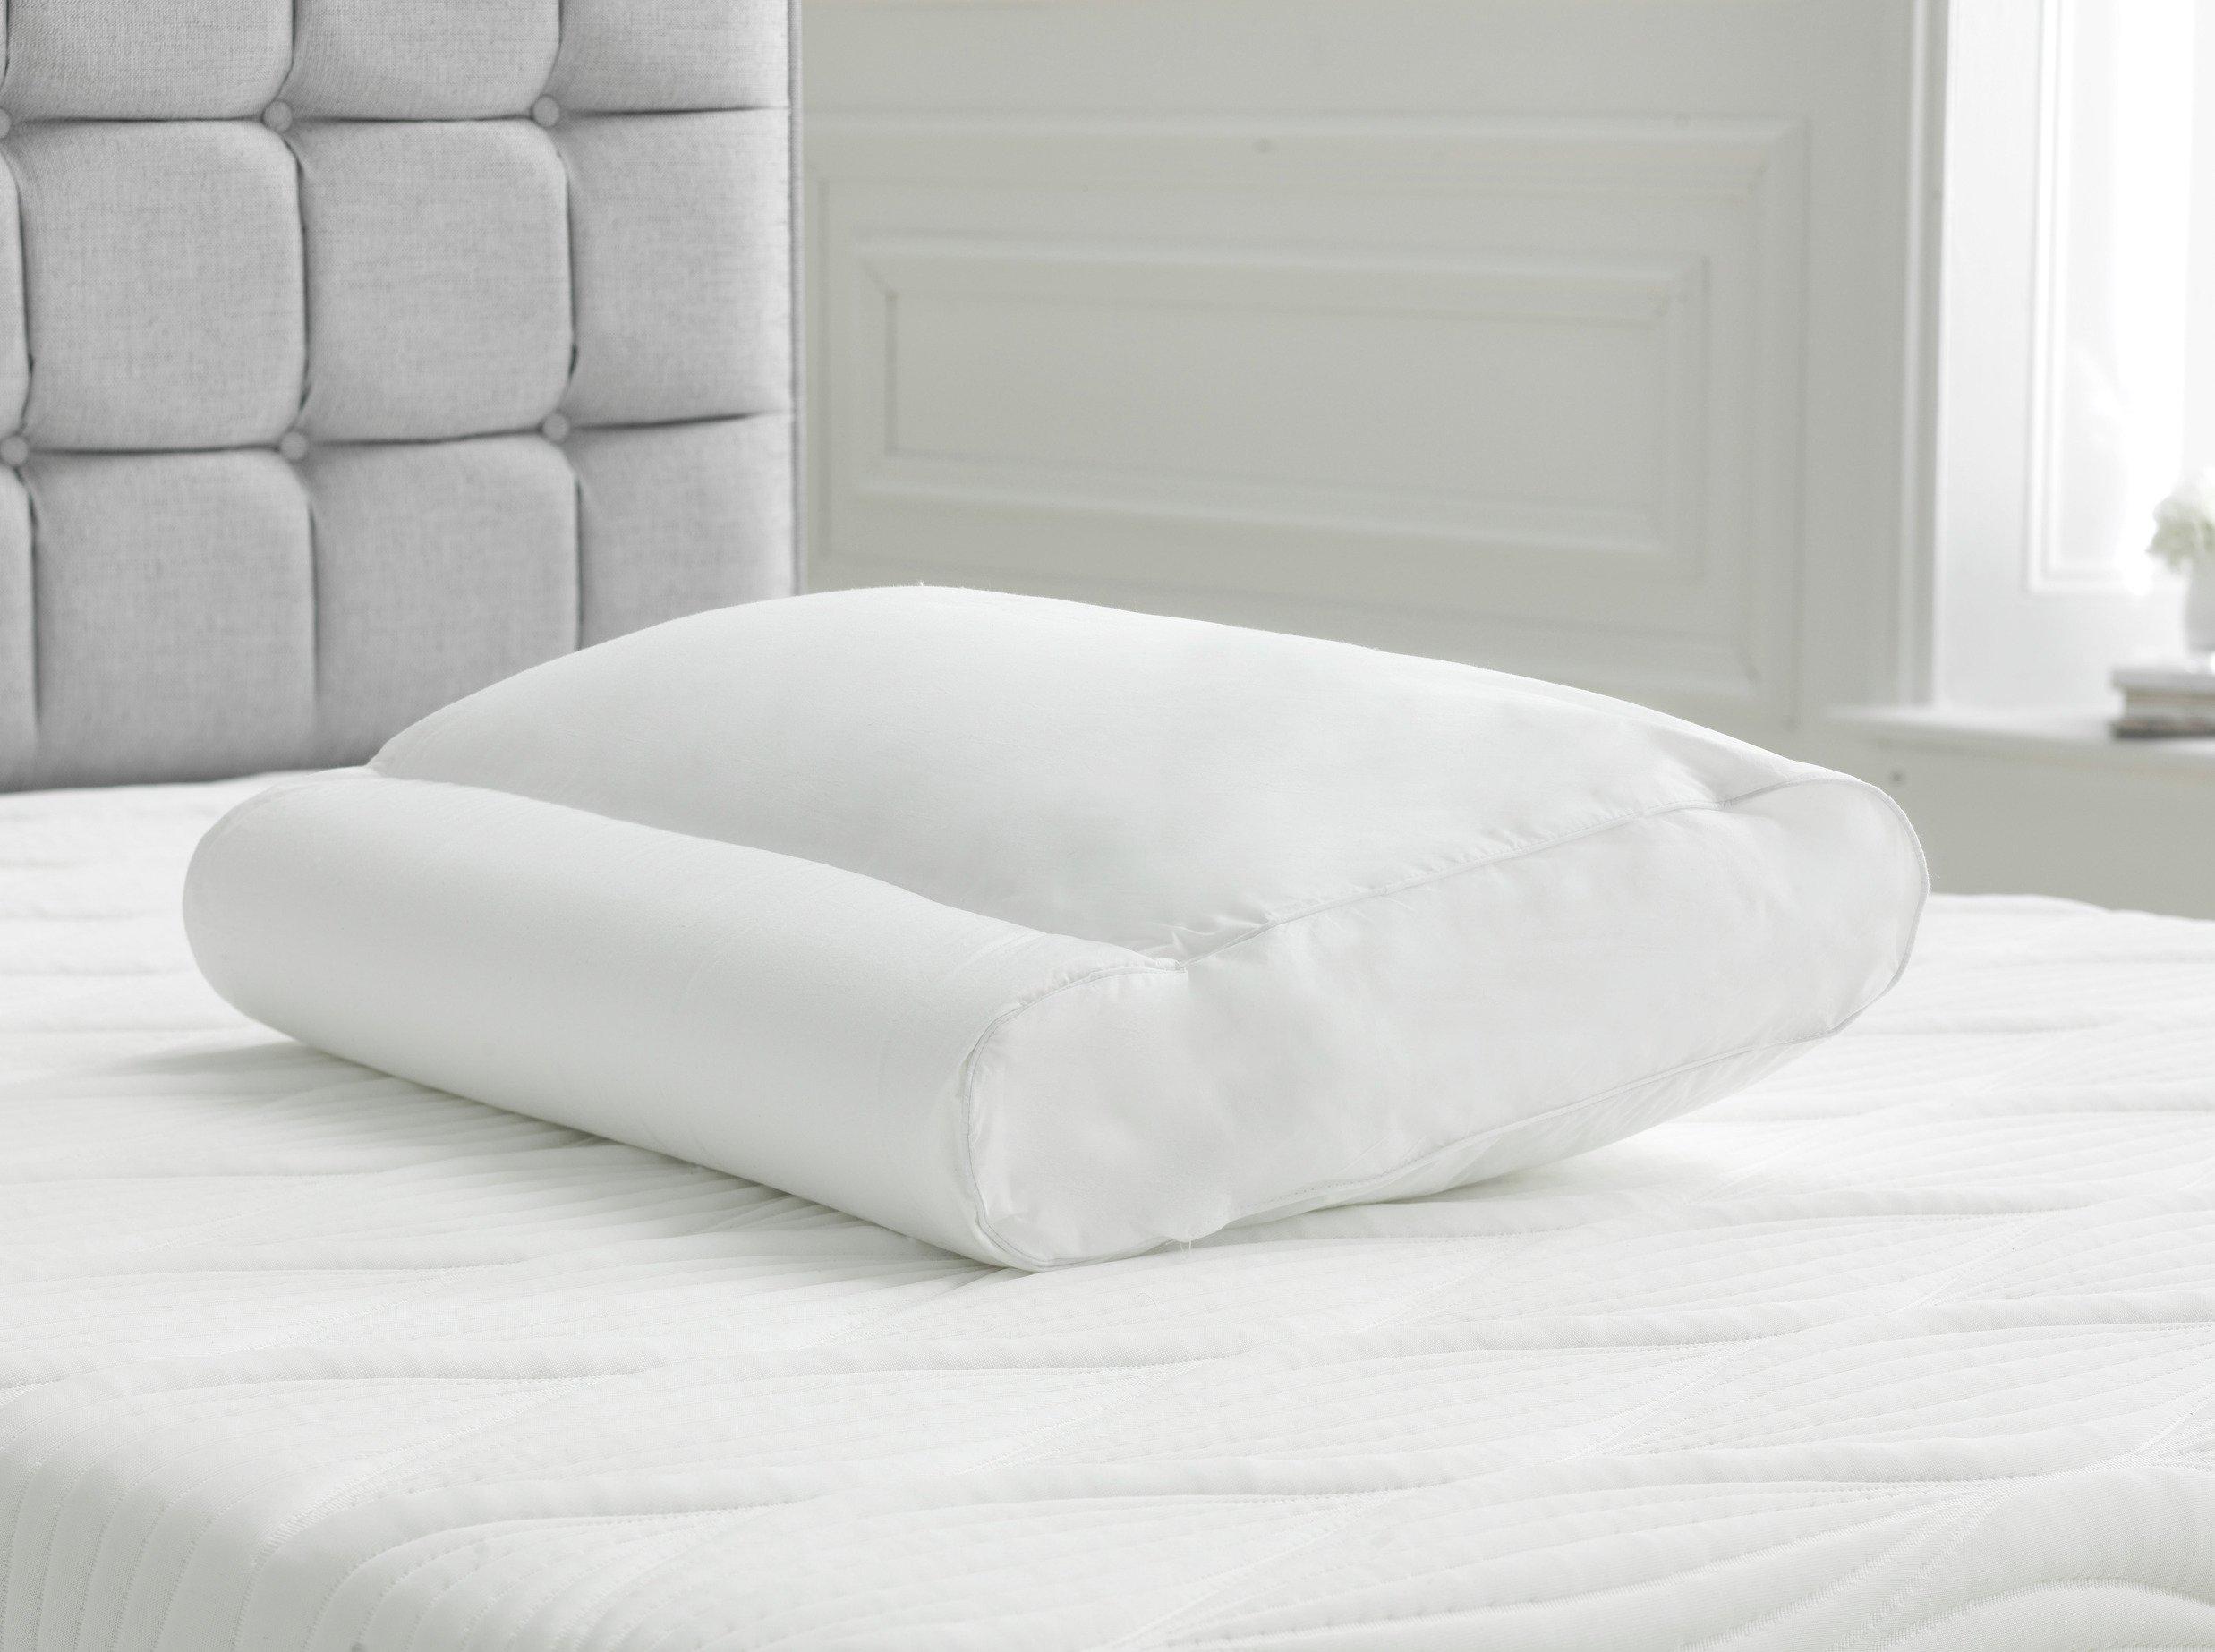 Image of Dormeo Duo Feel Pillow